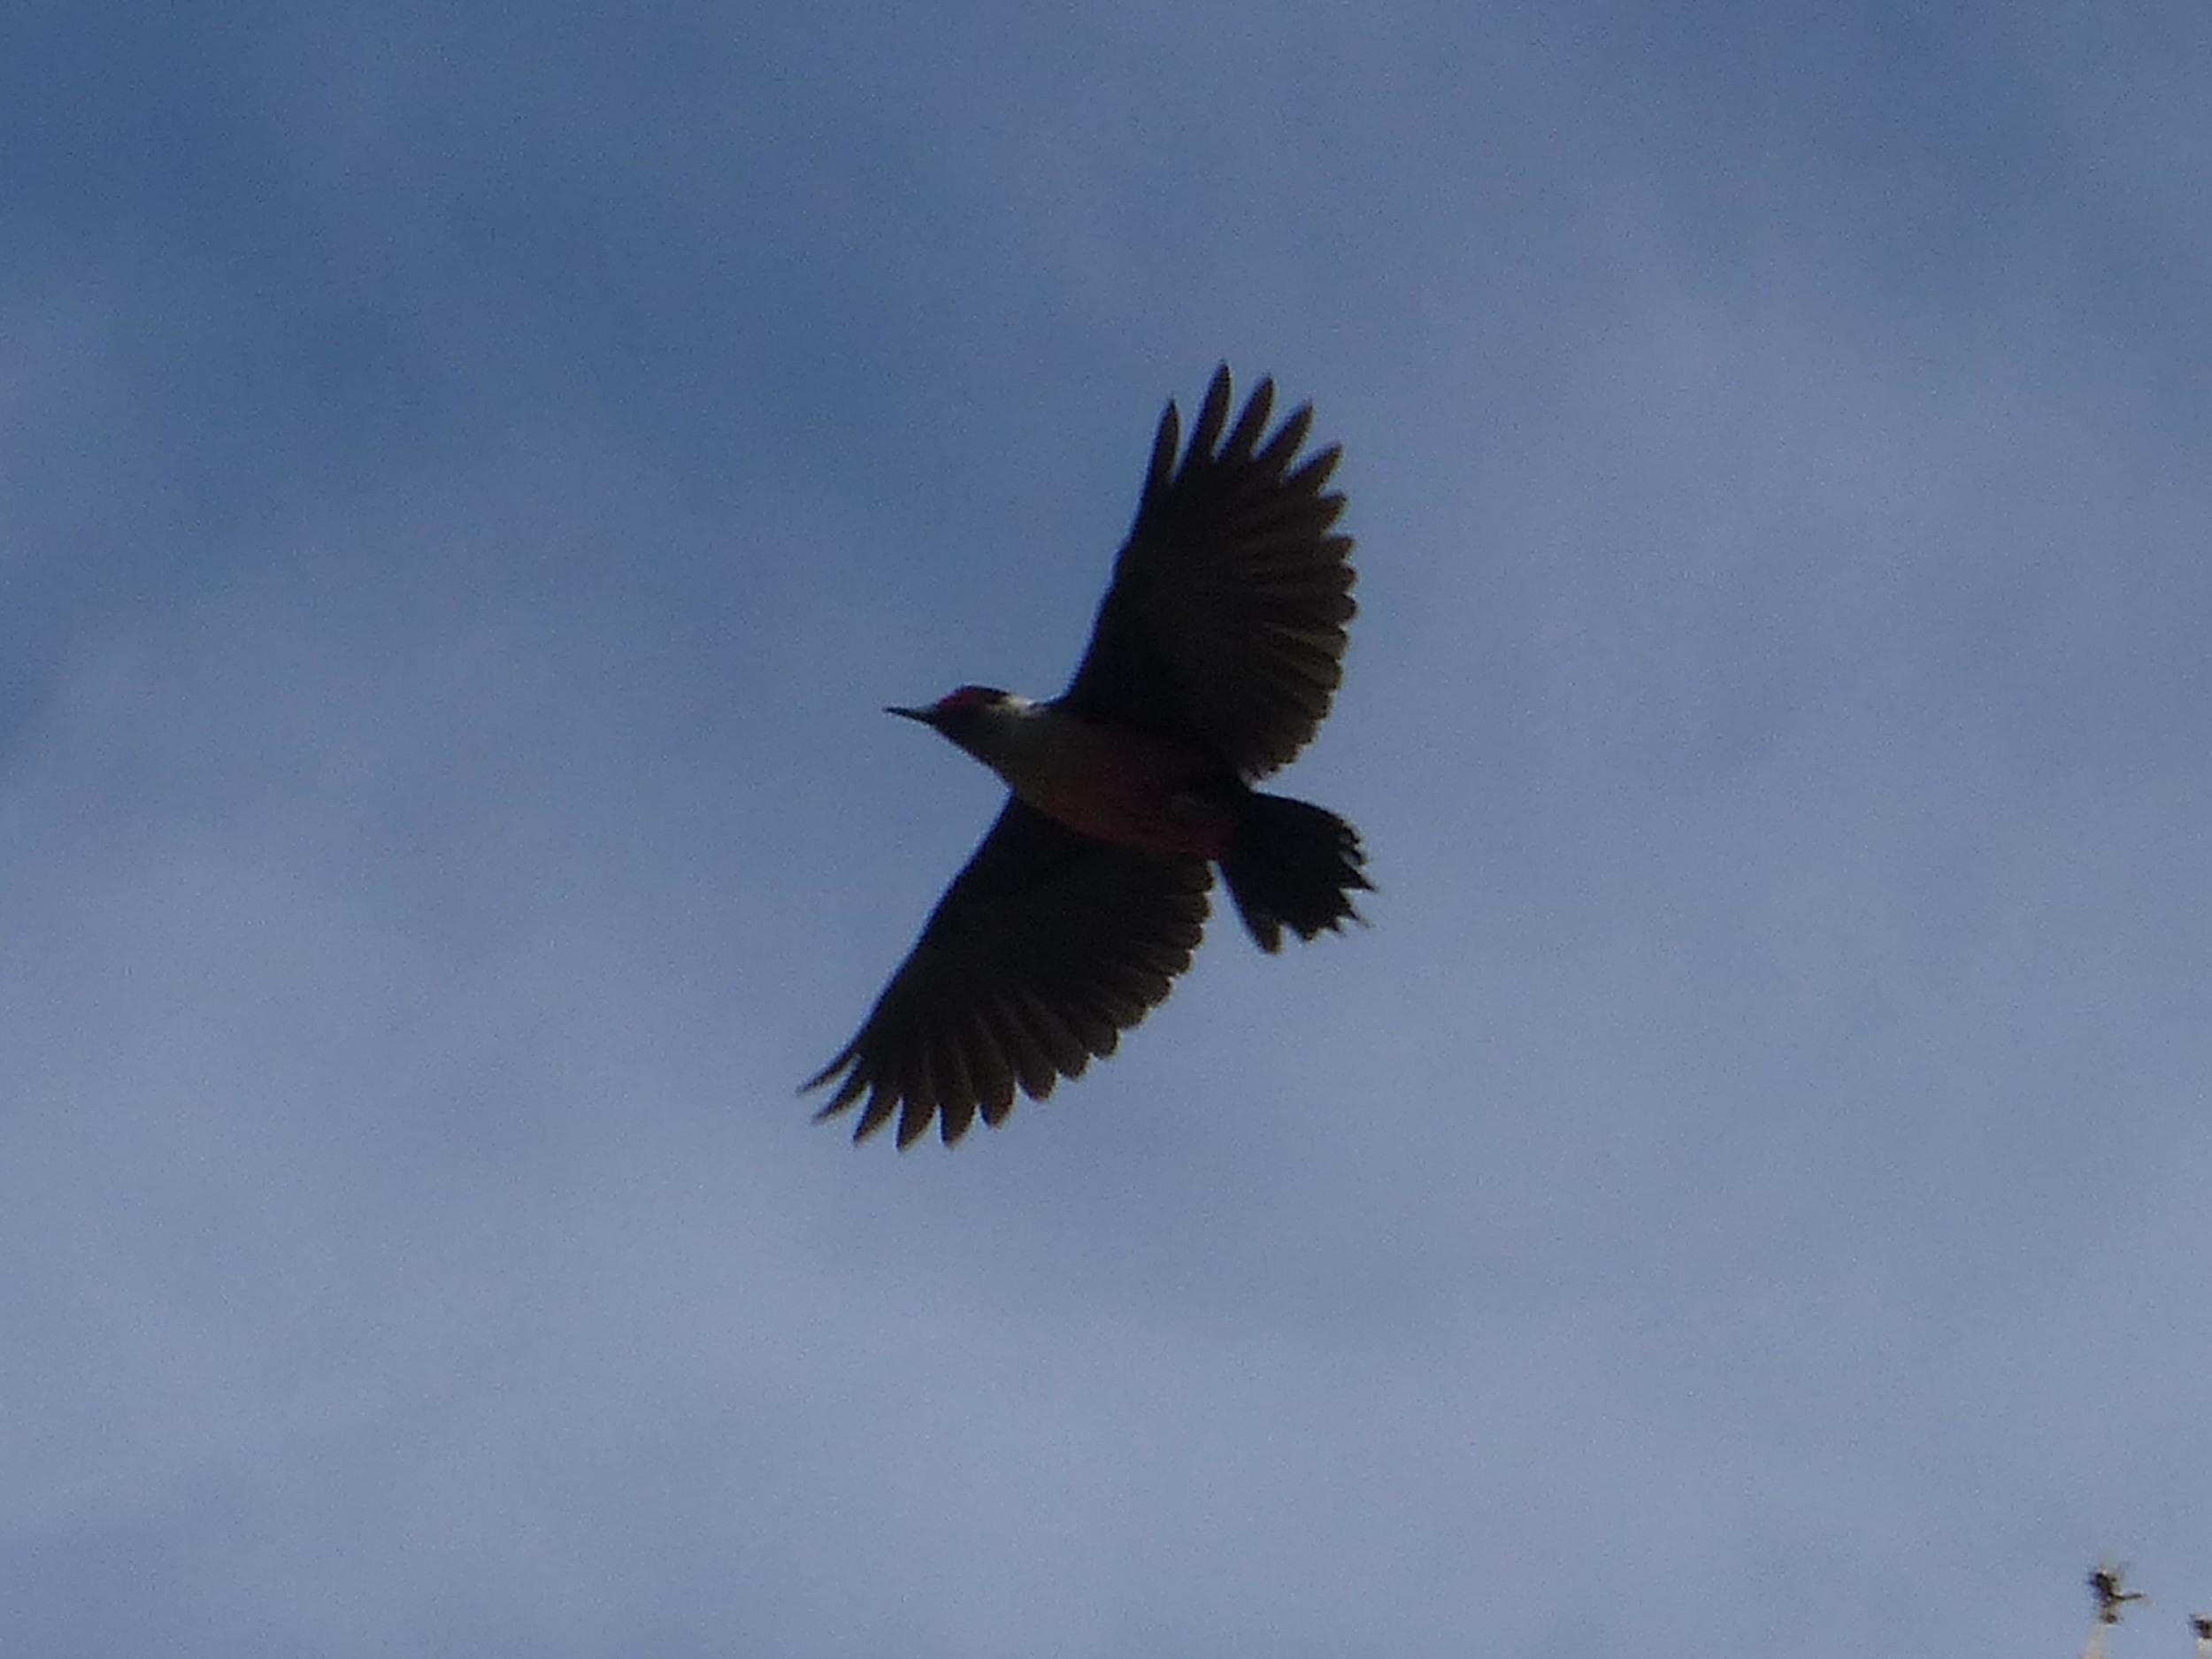 bhm P1160274 Lewiss Woodpecker flying.jpg